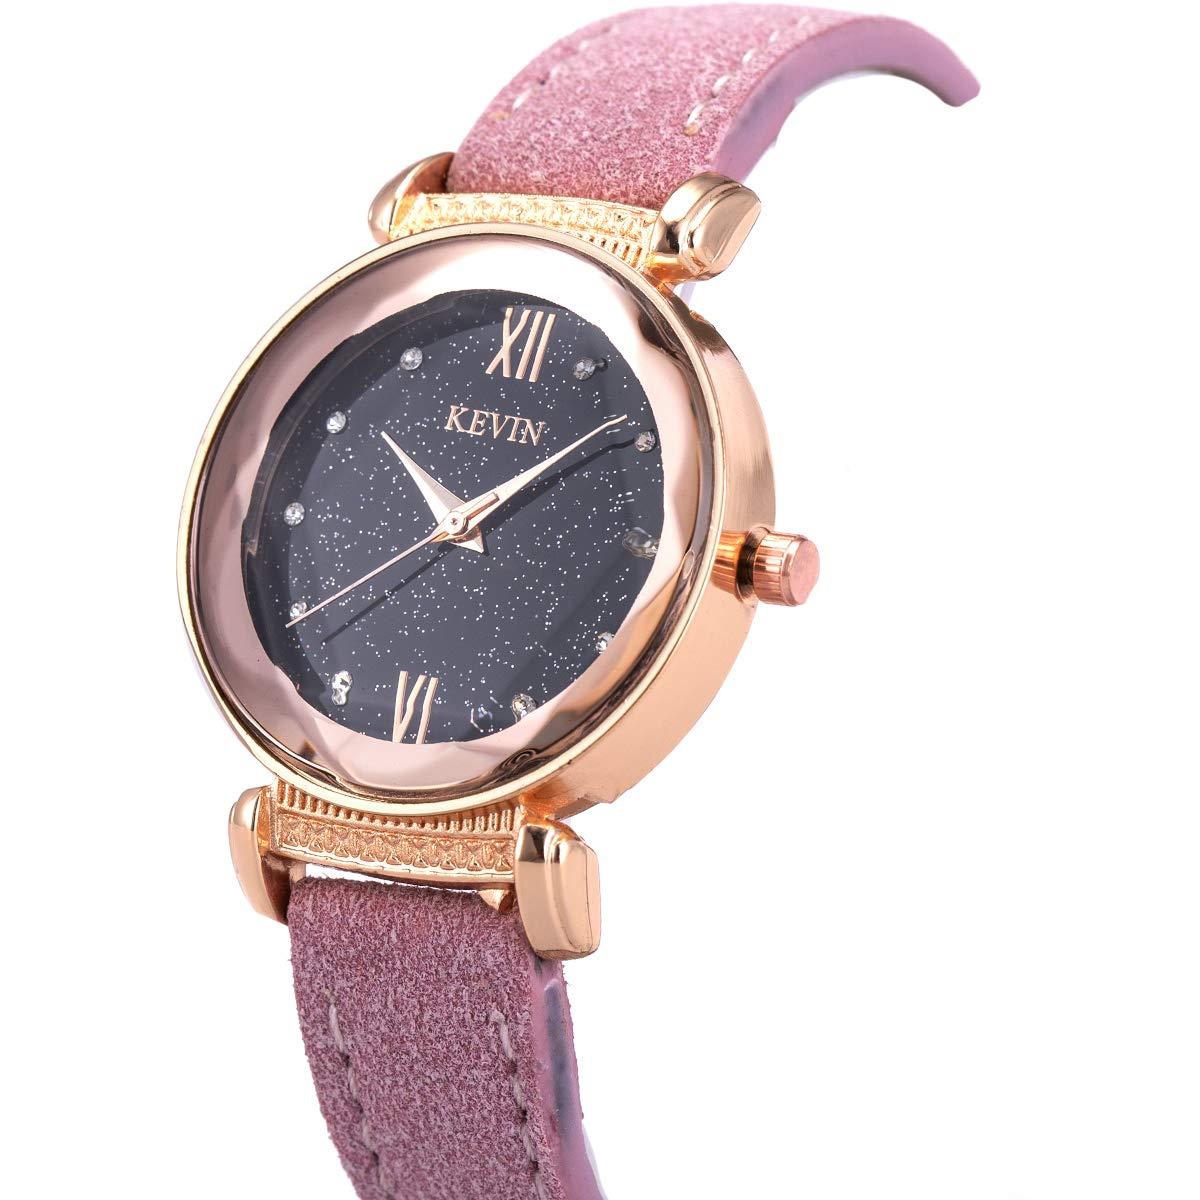 Wrist Watch Lady Women Crystal Leather Diamond-Shape Glass Roman Numerals SIBOSUN Galaxy Dial Quartz